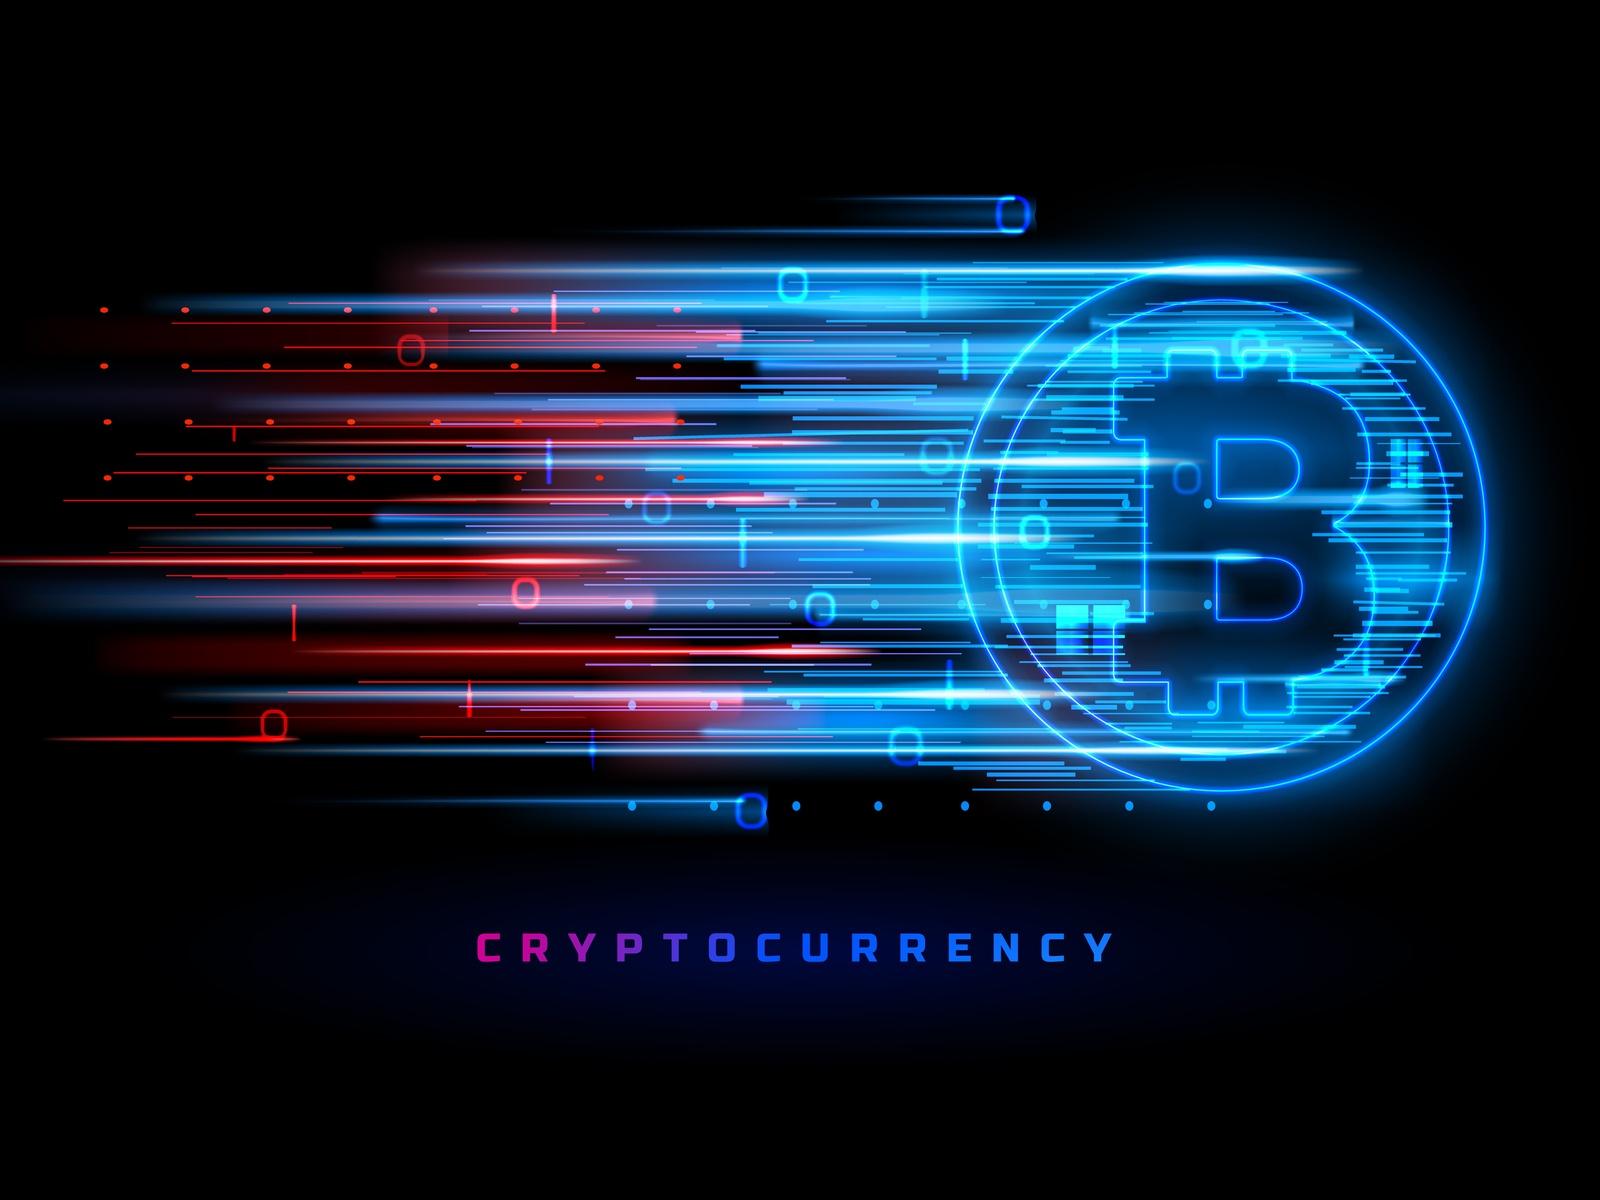 bitcoin-cryptocurrency5k-ne.jpg